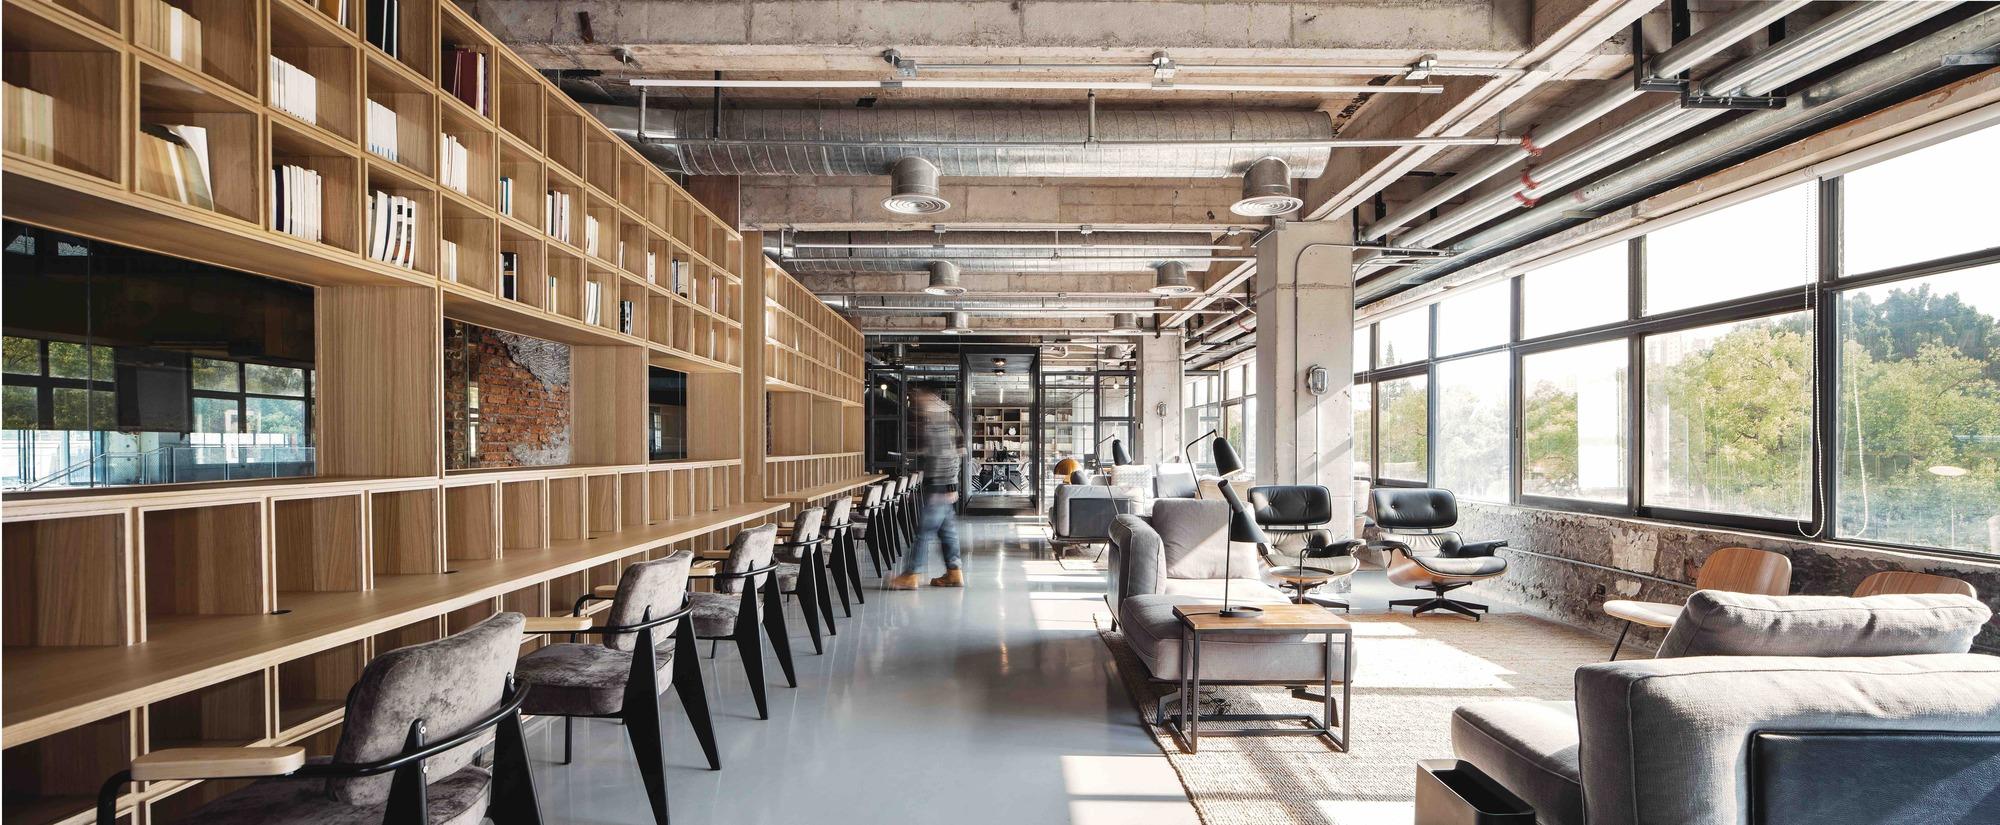 Flahalo Office Renovation Atelier LI ArchDaily